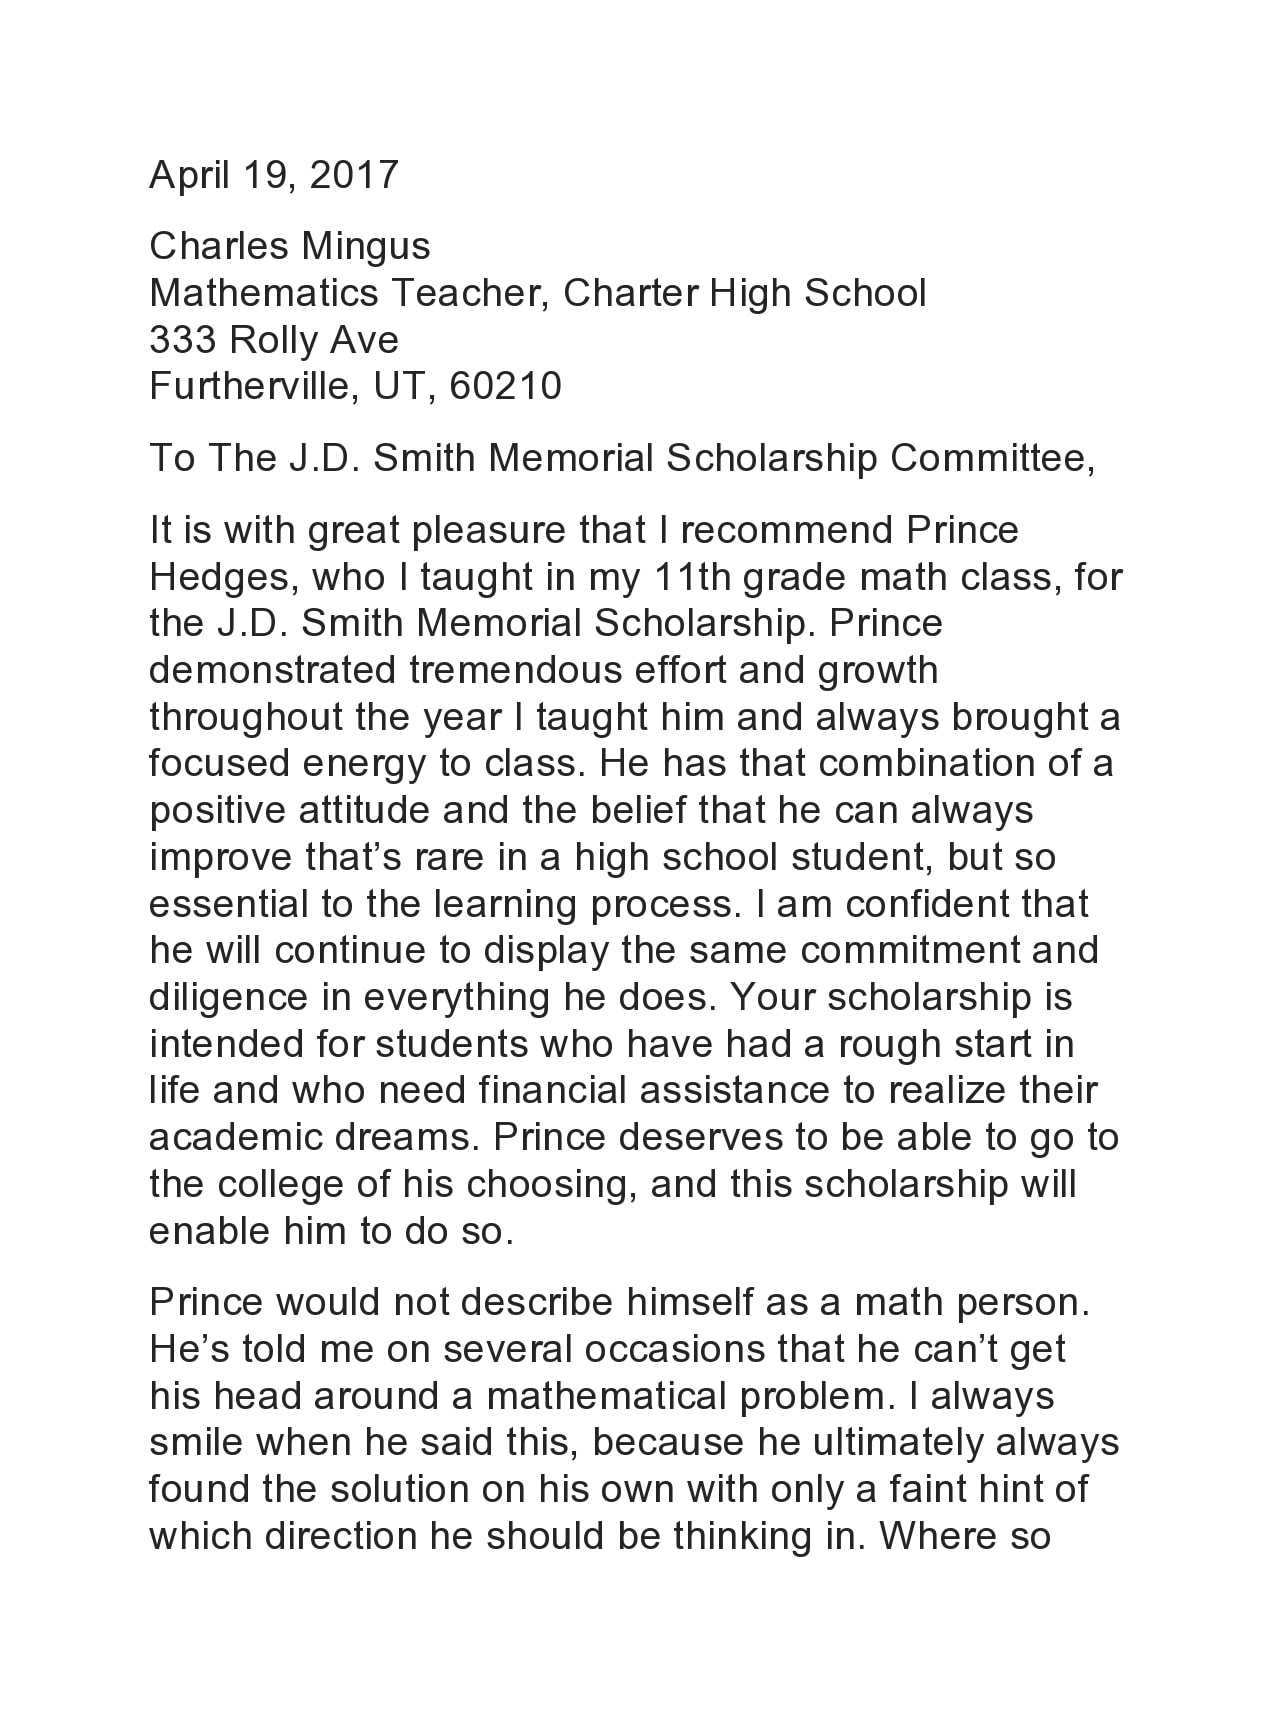 recommendation letter for scholarship 09